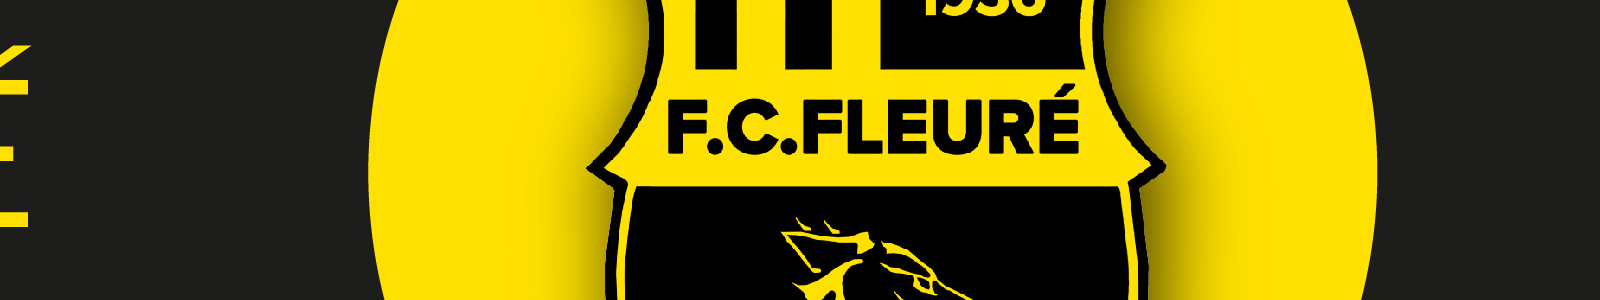 FOOTBALL CLUB FLEURÉ  : site officiel du club de foot de FLEURE - footeo